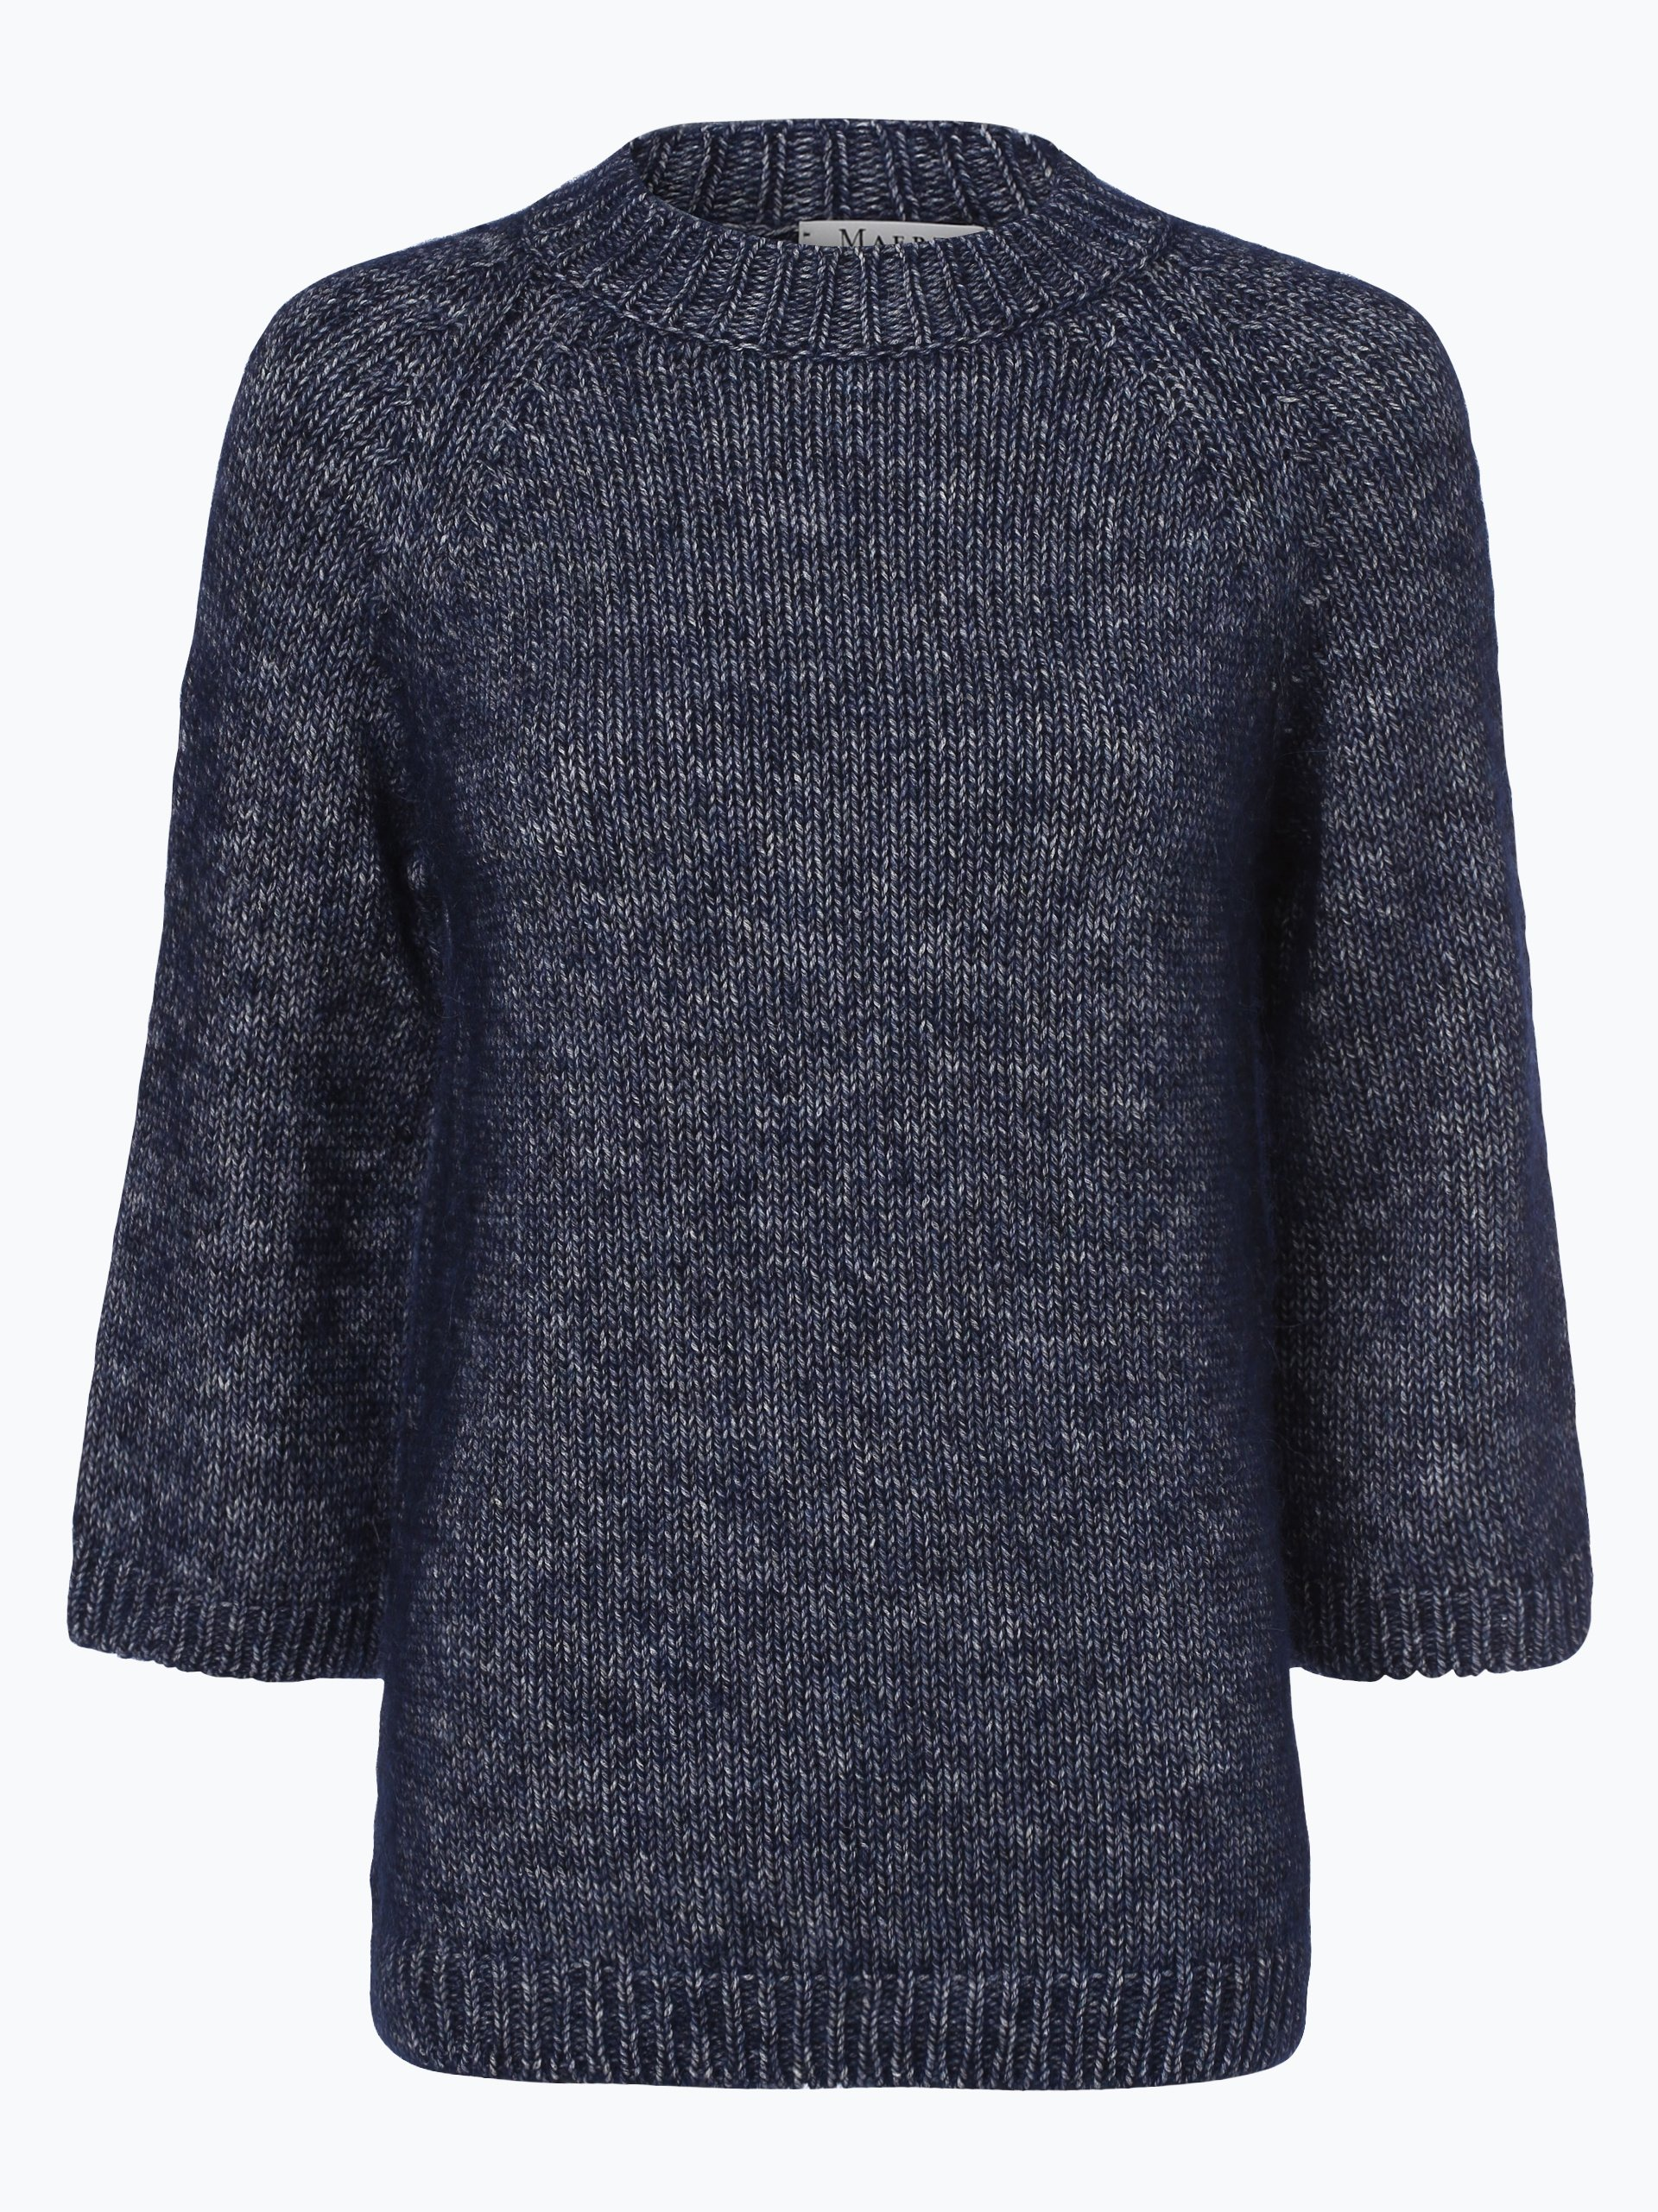 maerz damen pullover mit alpaka anteil blau meliert online. Black Bedroom Furniture Sets. Home Design Ideas